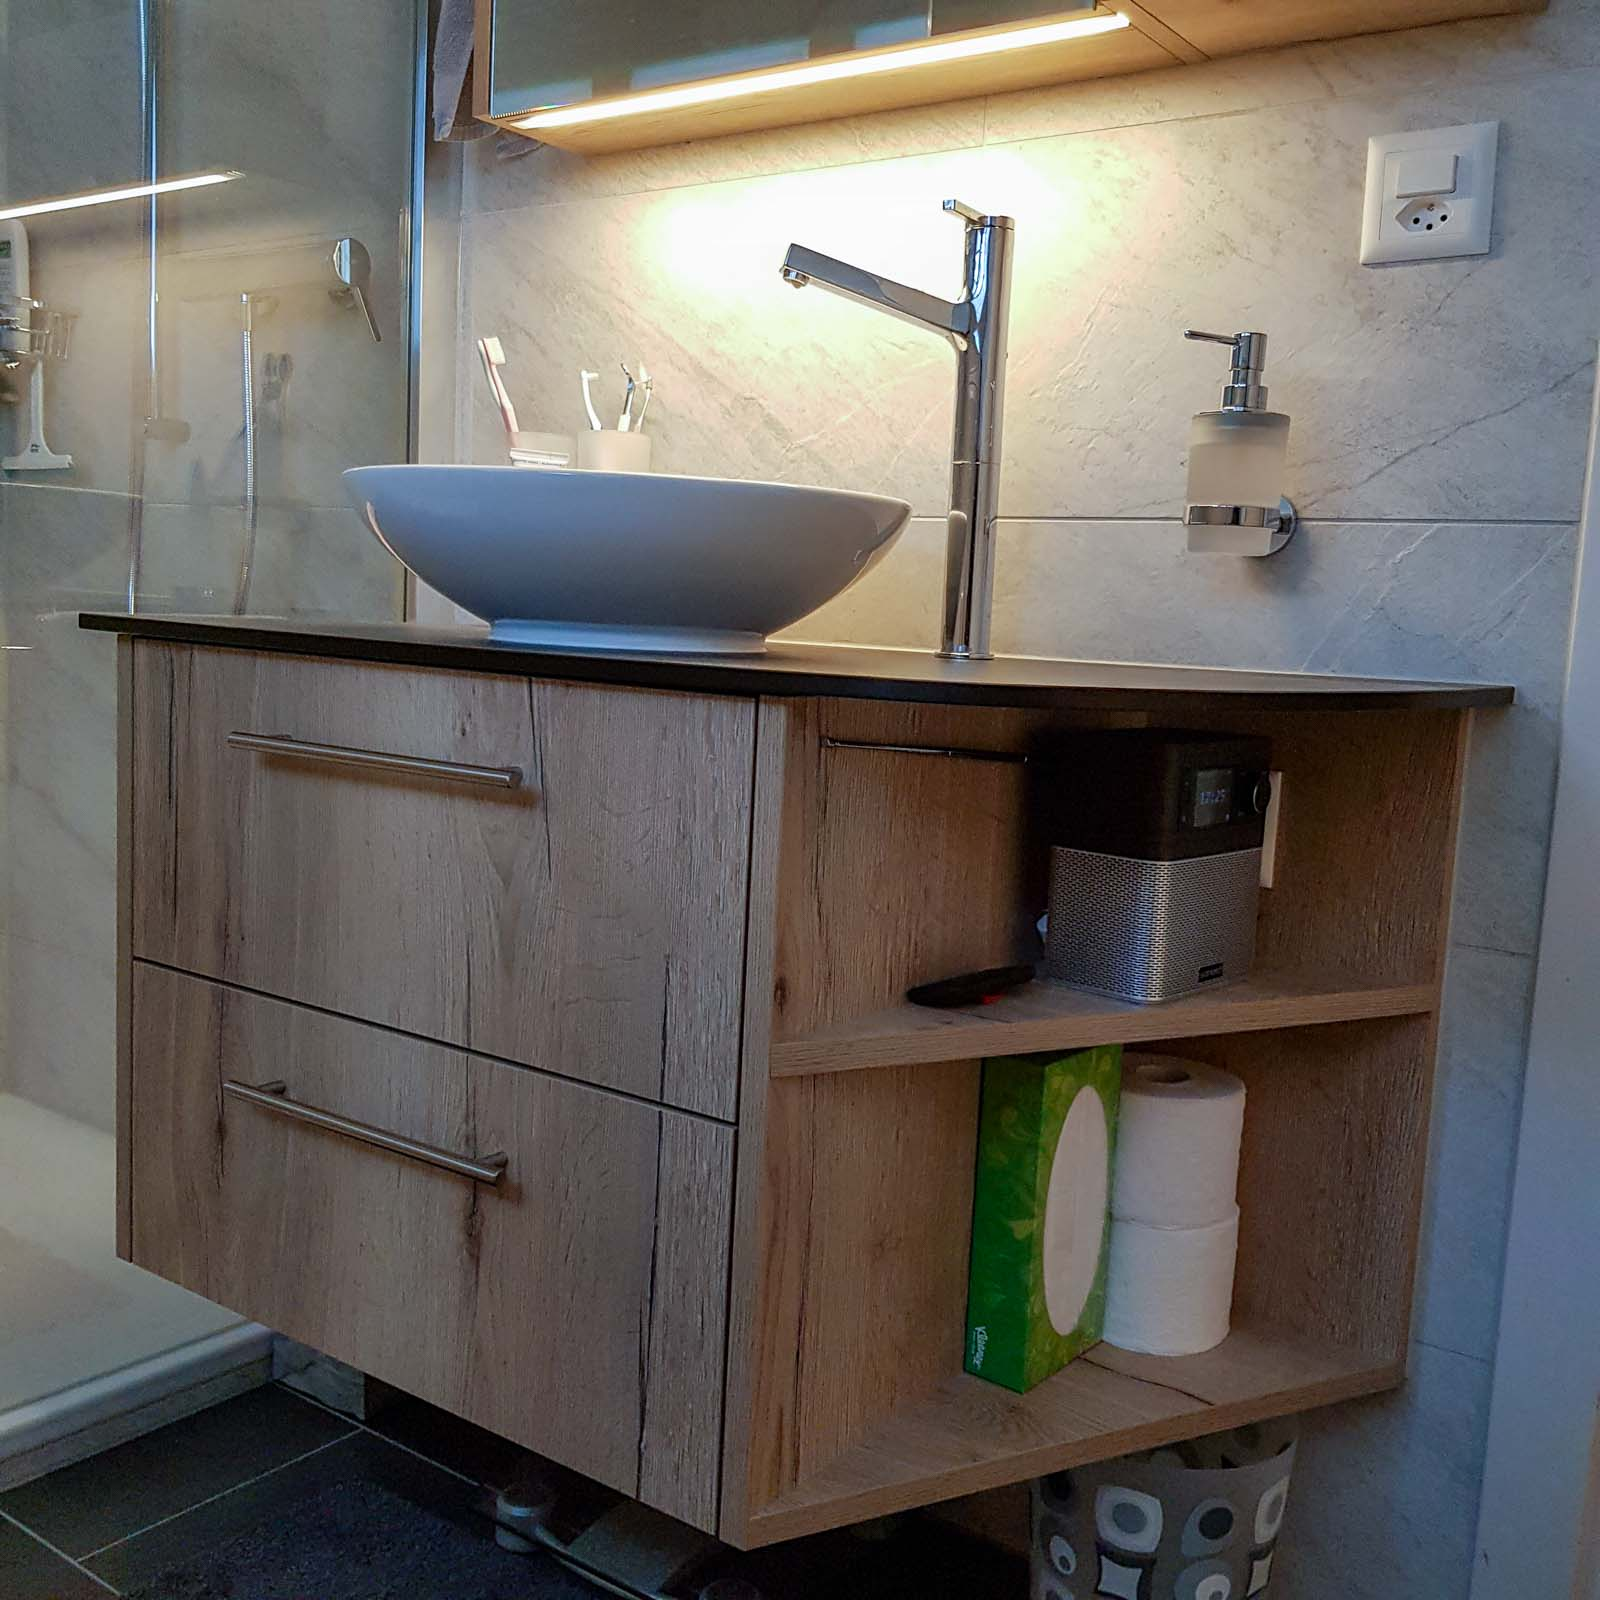 Wooddesign_Badmöbel_ Badumbau_LED Beleuchtung_Holzdecor_Vollkernplatte_Becken aufgesetzt (1)